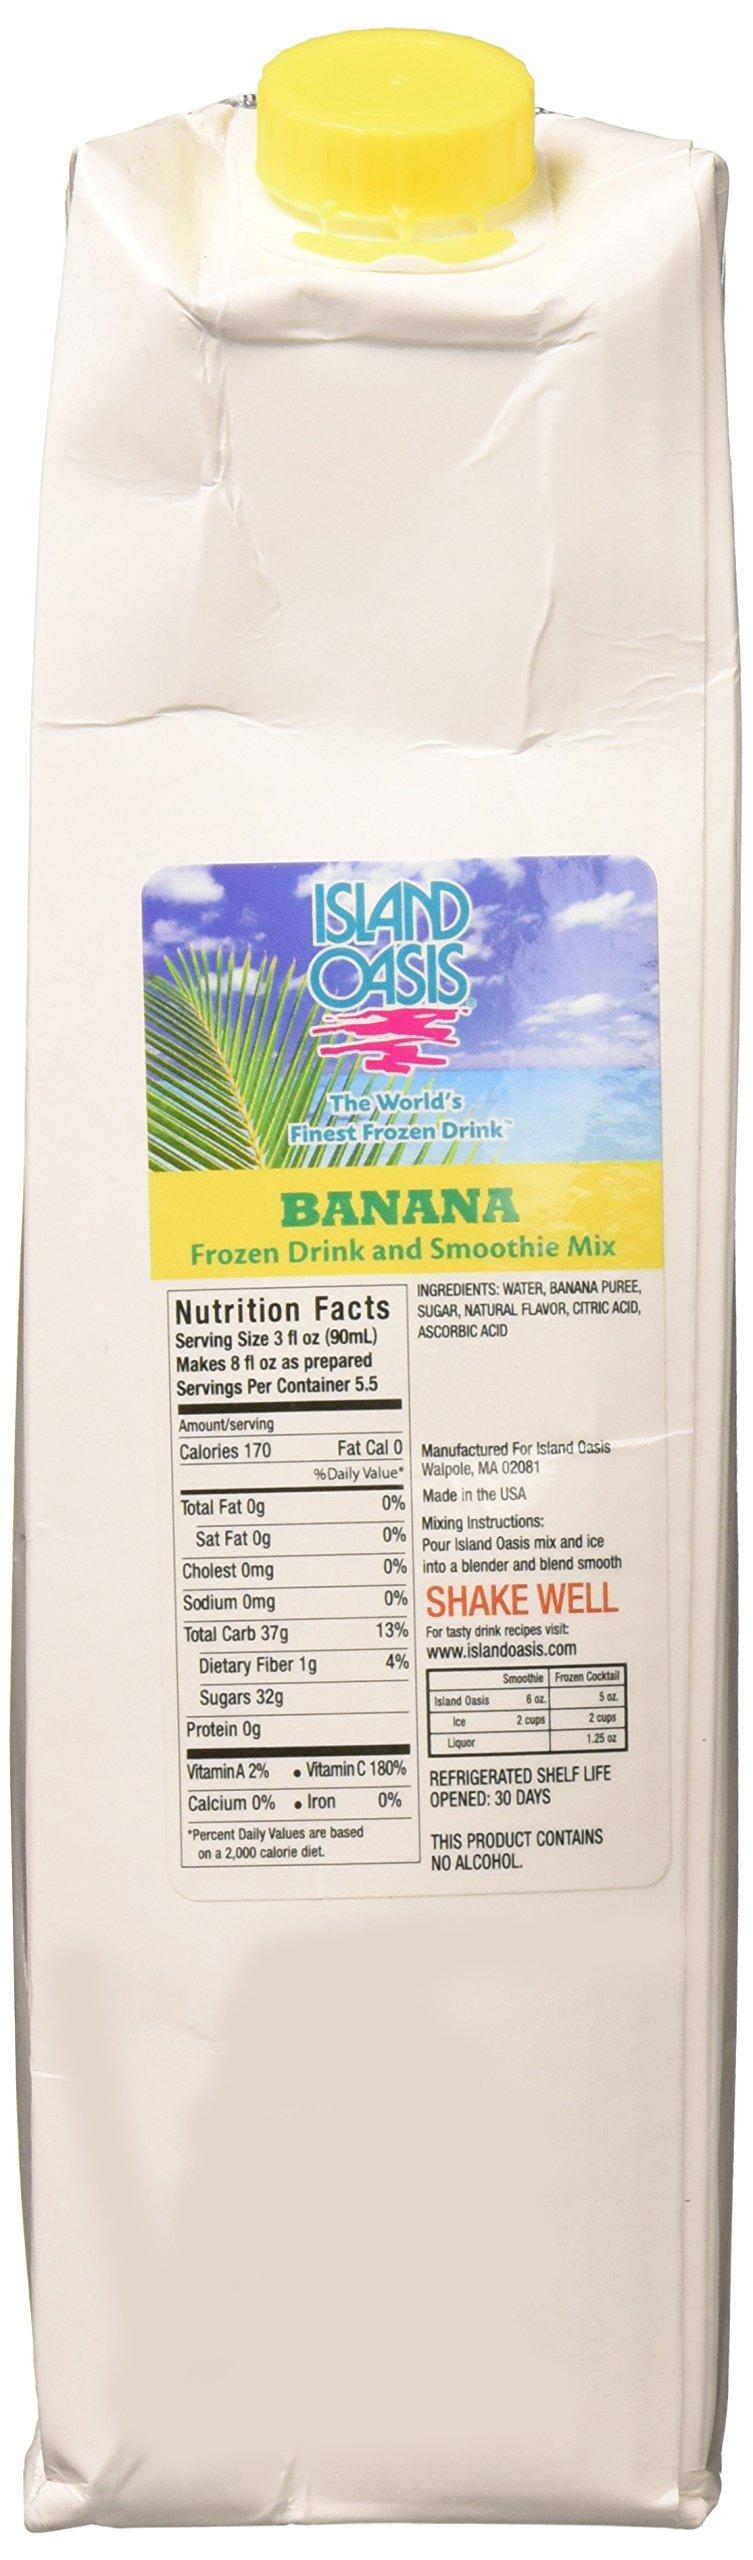 Island Oasis Premium Pina Colada Drink Mix